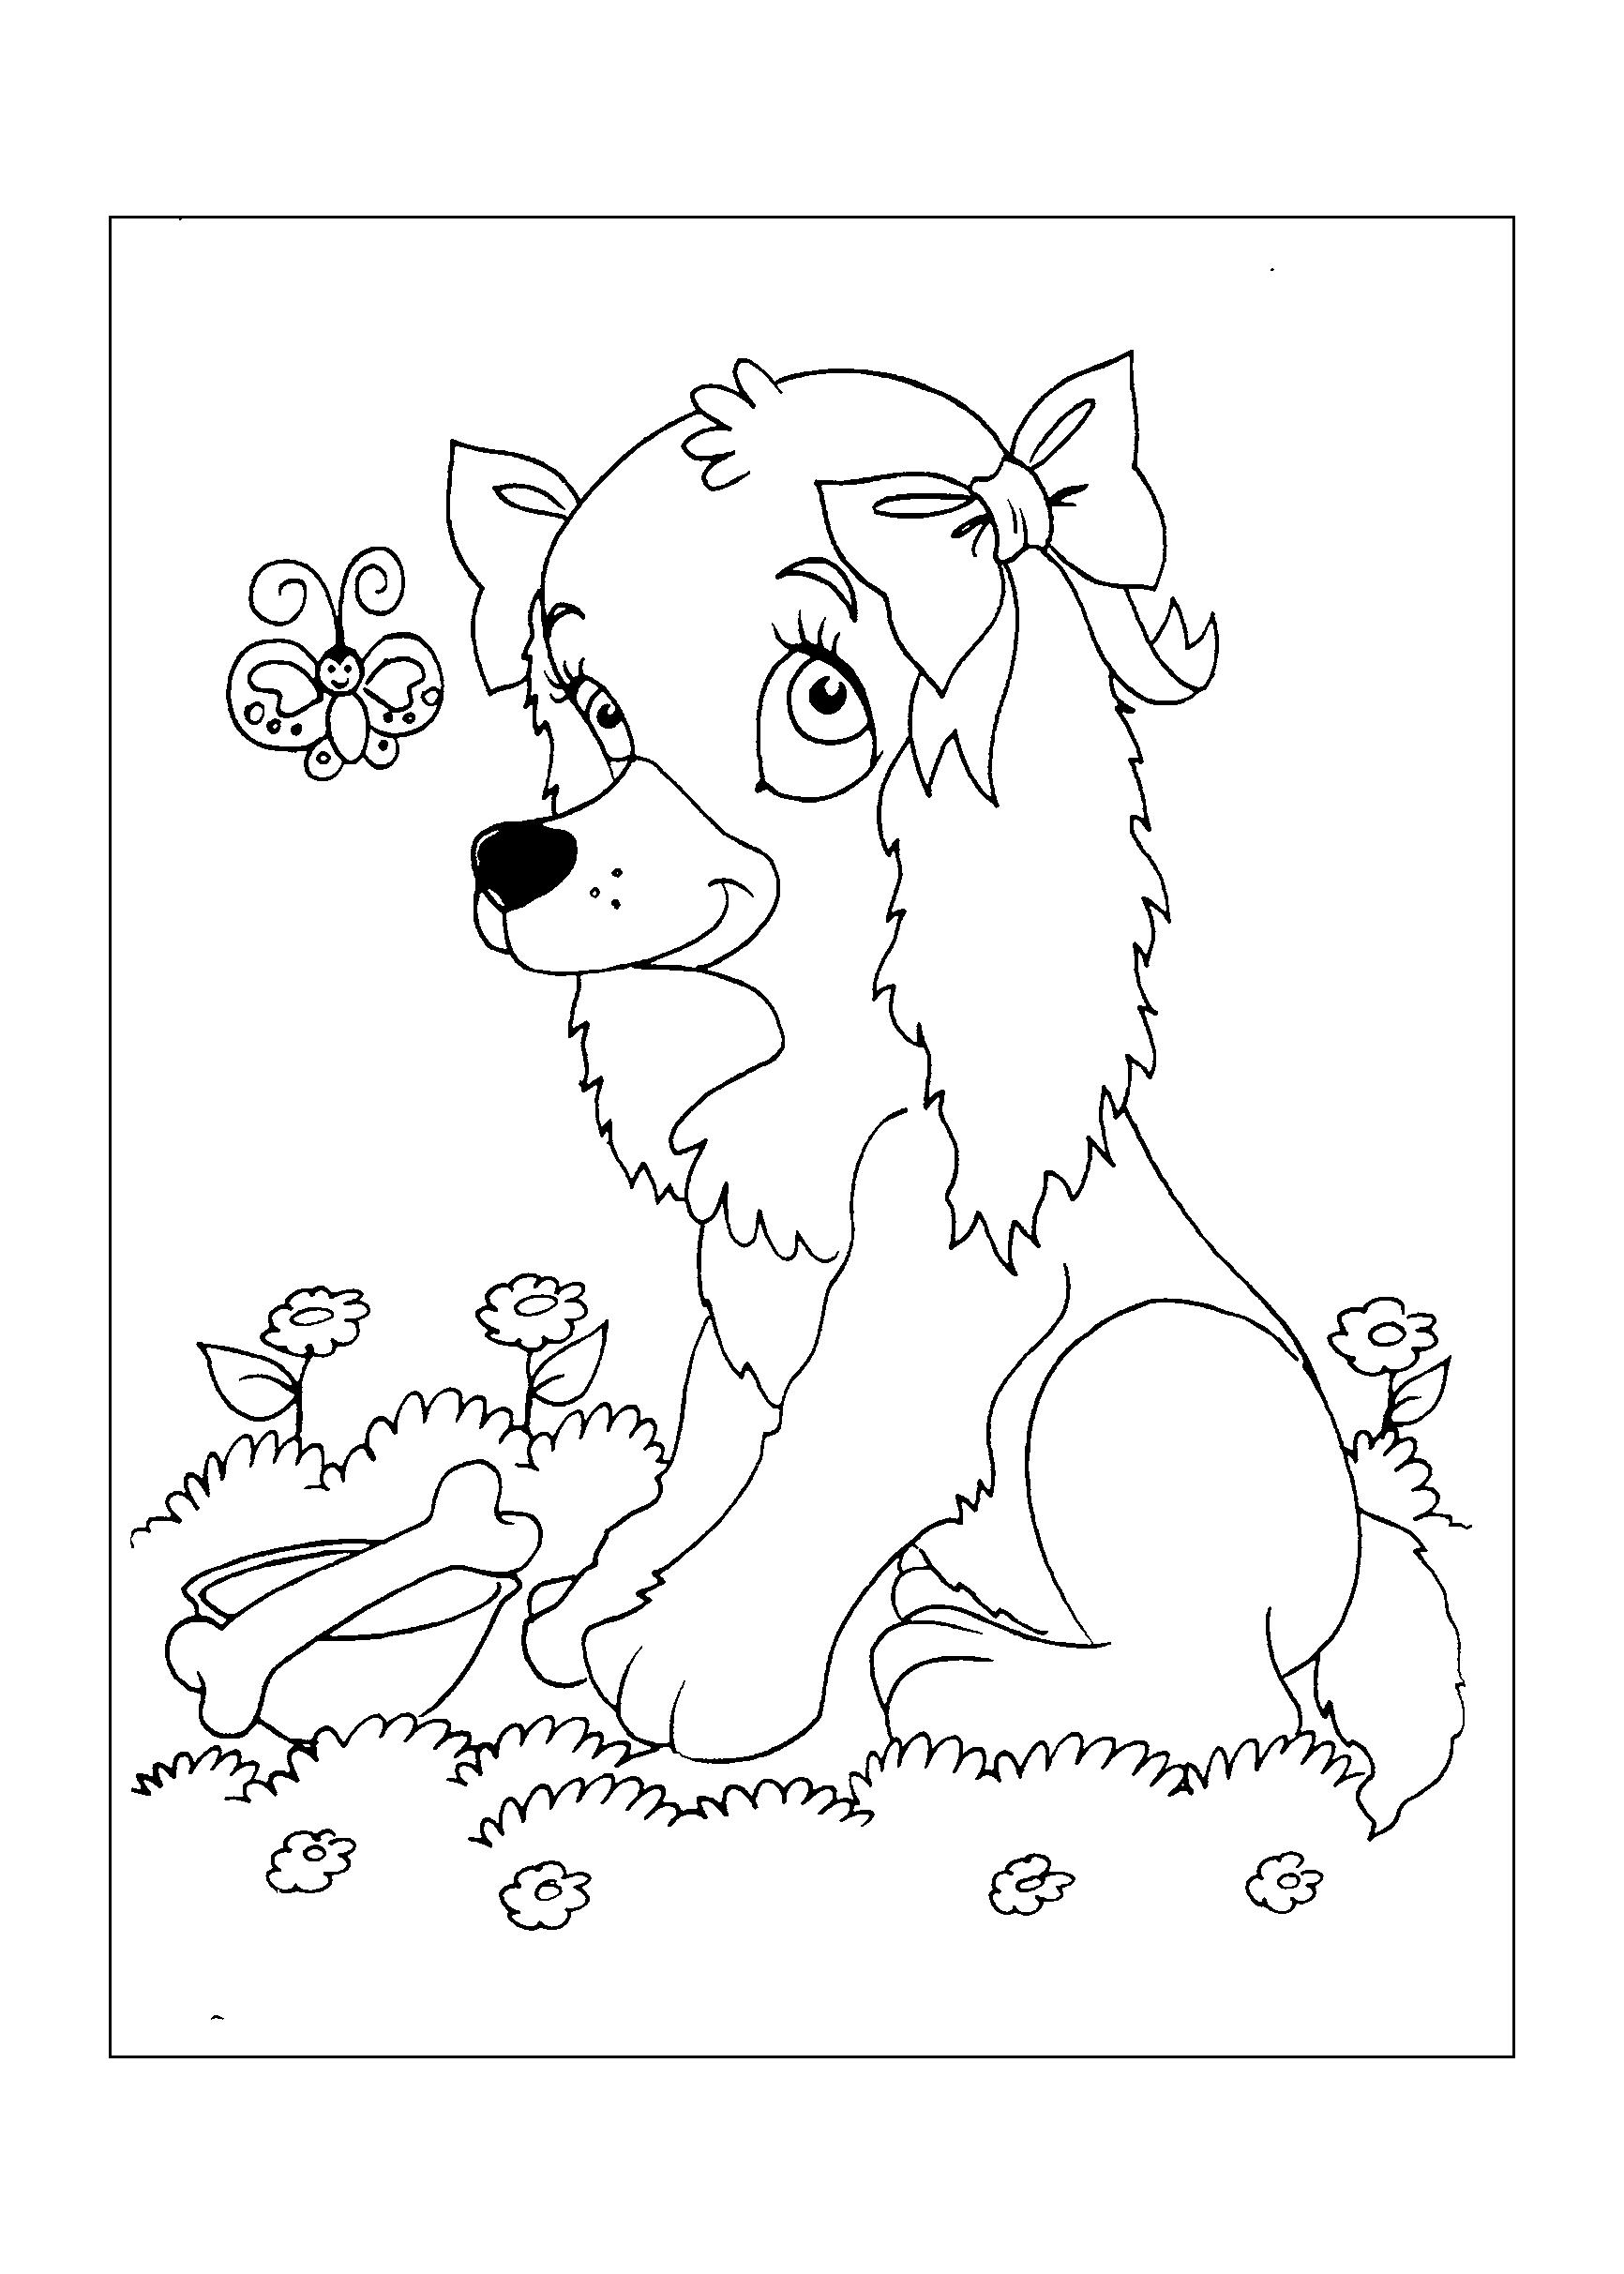 0169-desenho-colorir-cachorra